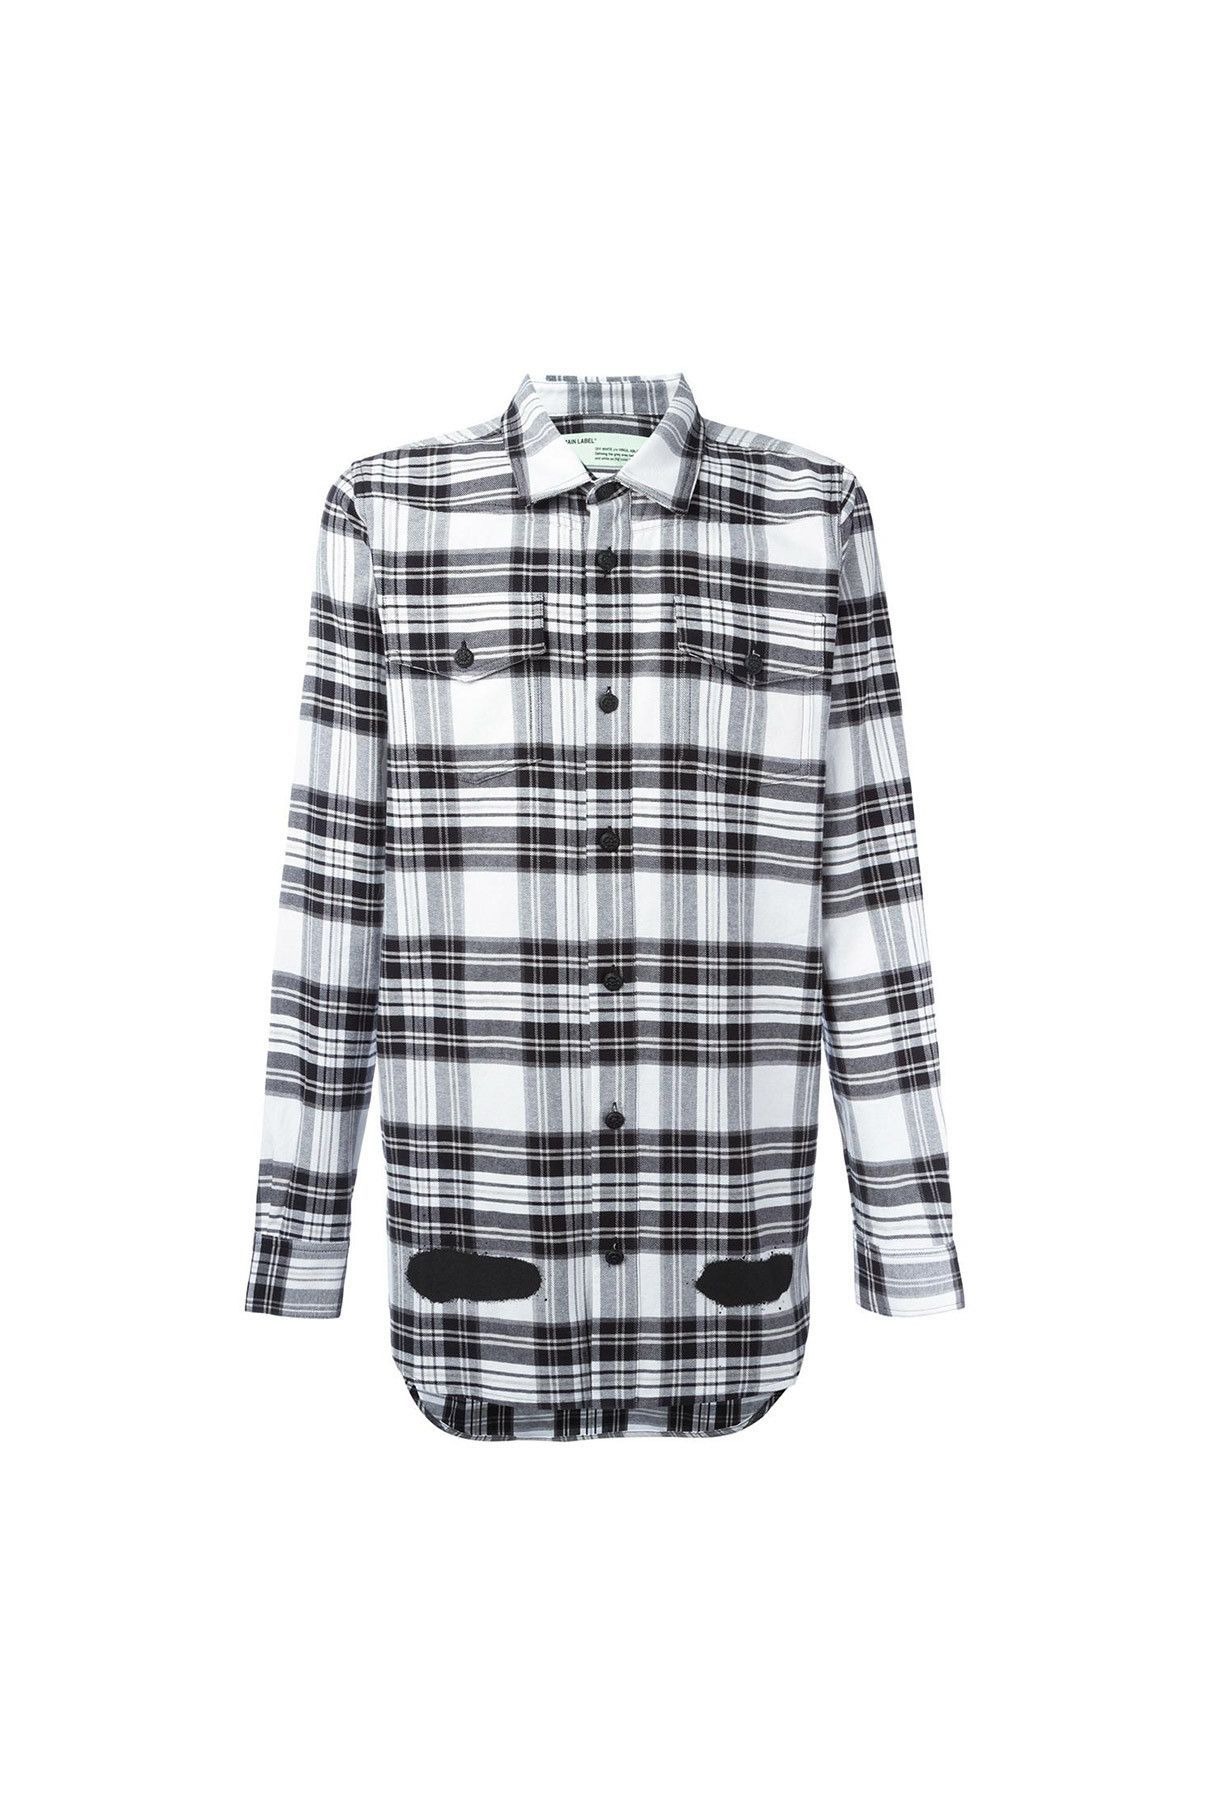 37ab3c4deb  Off-White   01 clothing   02 top   02 shirt  Diagonal Spray Check Shirt